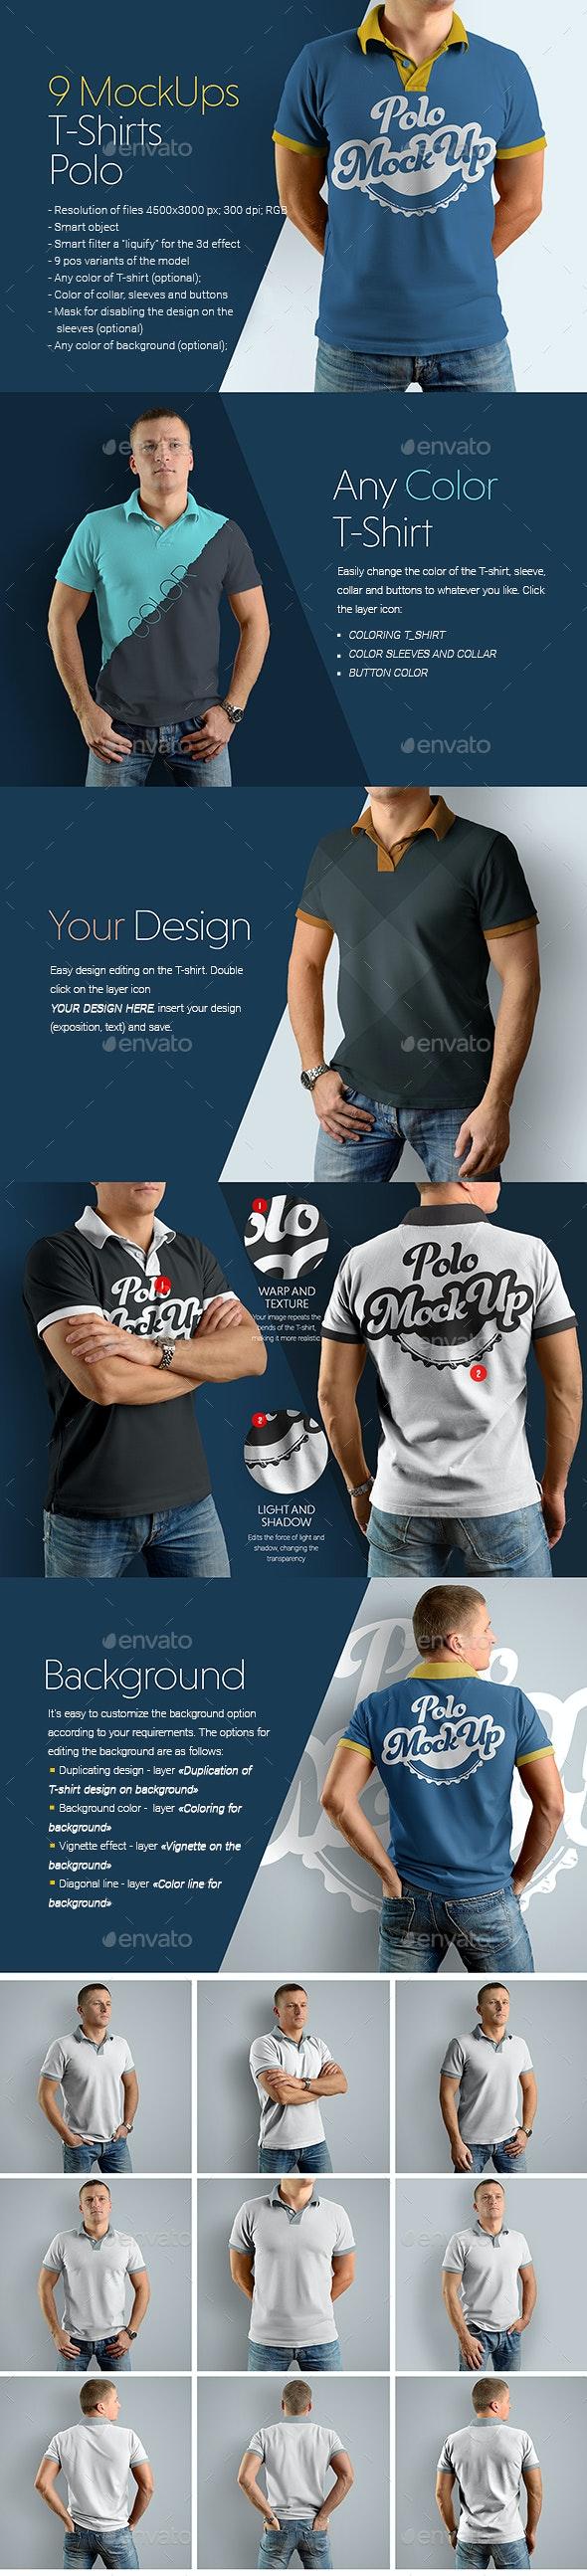 9 Mockups Polo T-Shirts on the Man - T-shirts Apparel